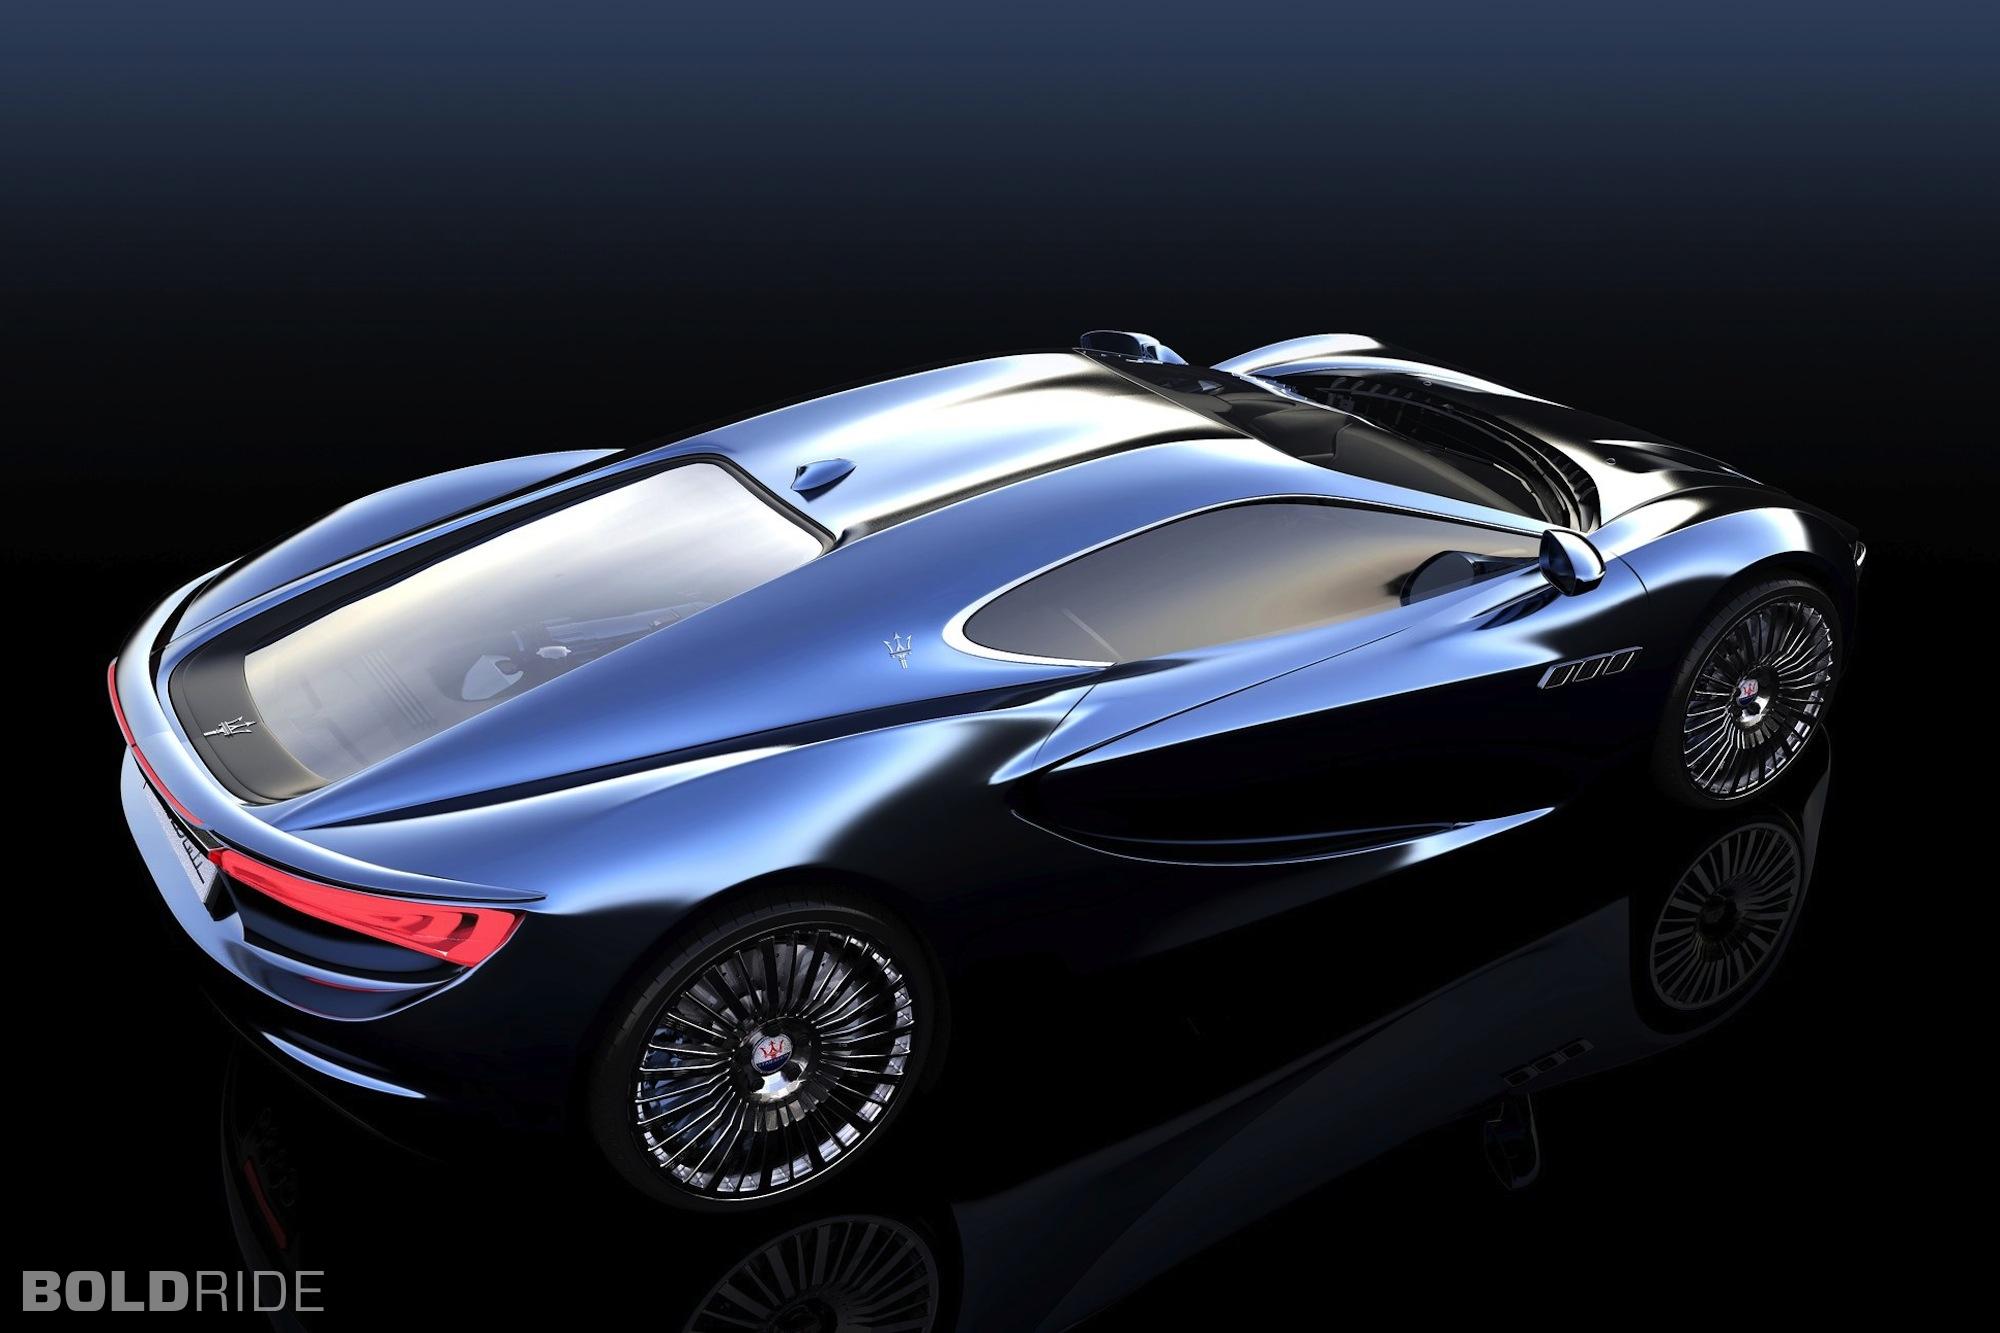 2013 Maserati Bora Concept by Alex Imnadze supercar h ...